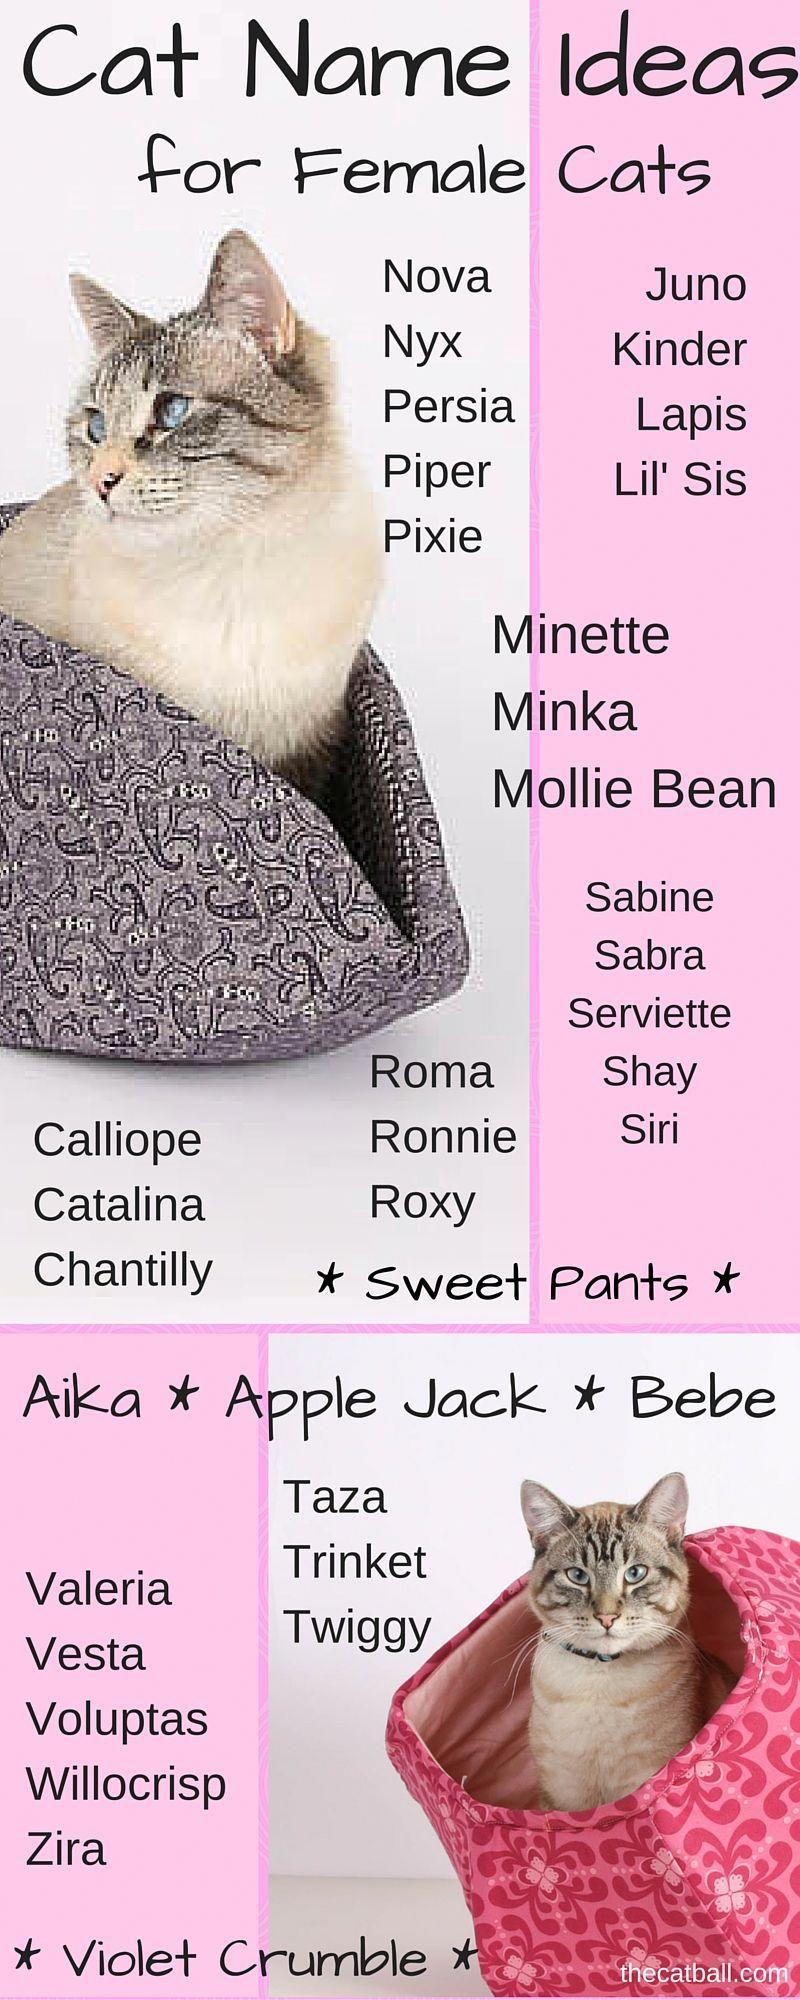 Cat Name Ideas For Female Cats Cat Names Kitten Names Cute Cat Names